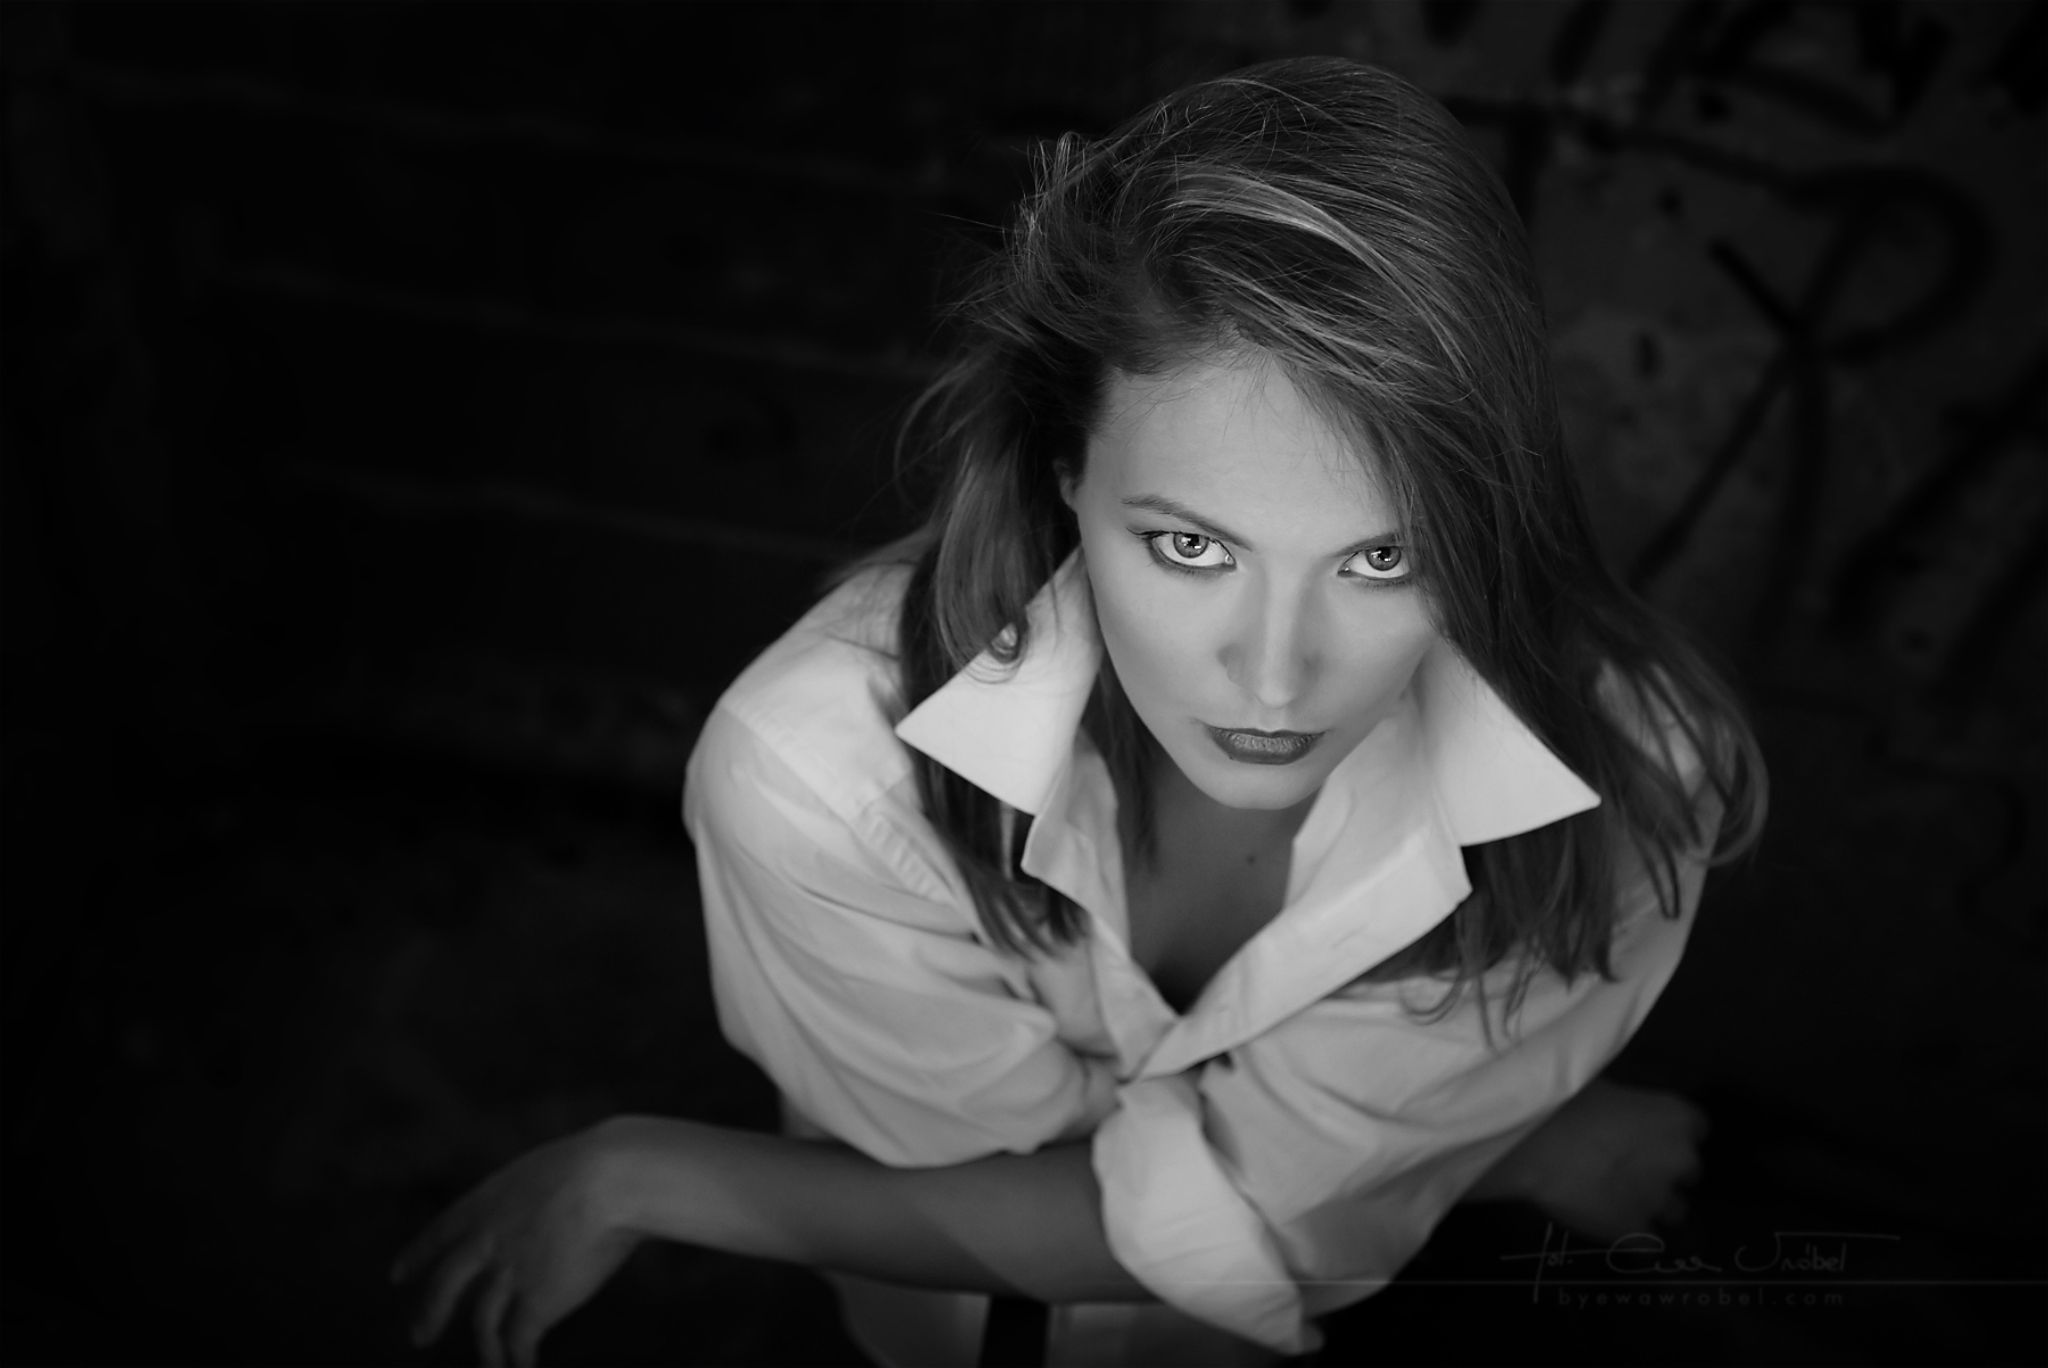 Valeria by byewawrobel